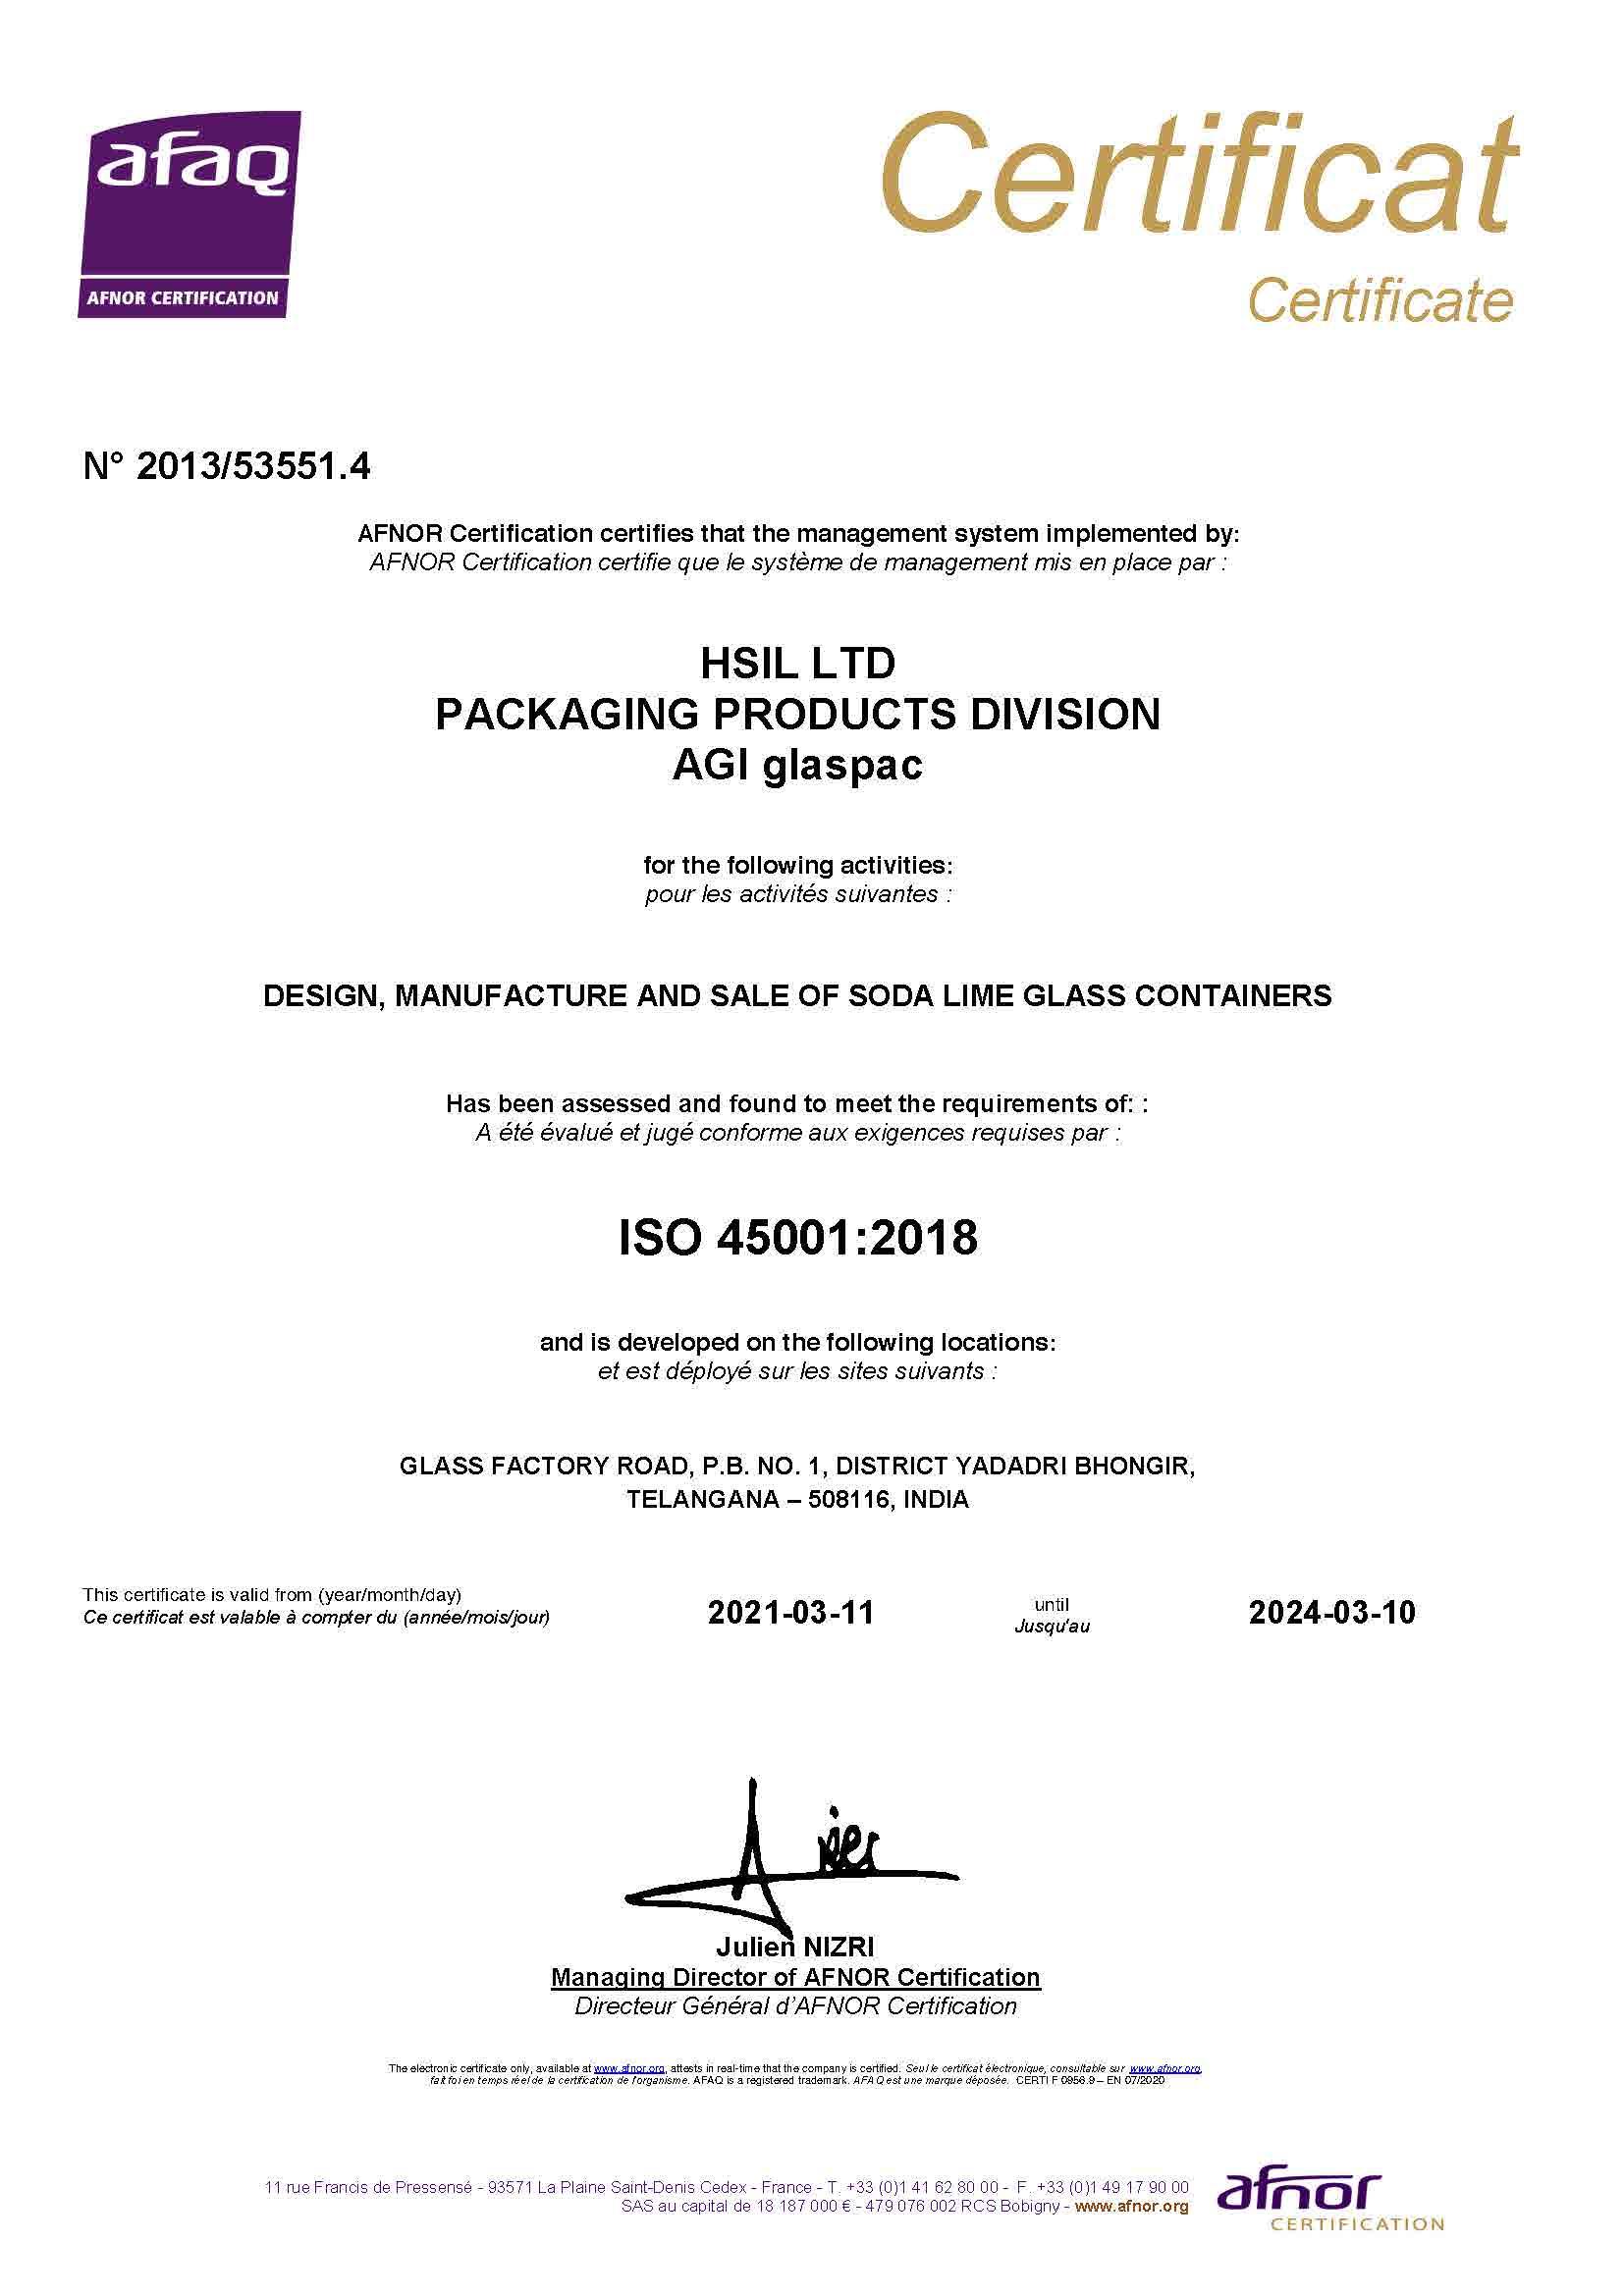 Bhongir-New-Certificate-45001:2018